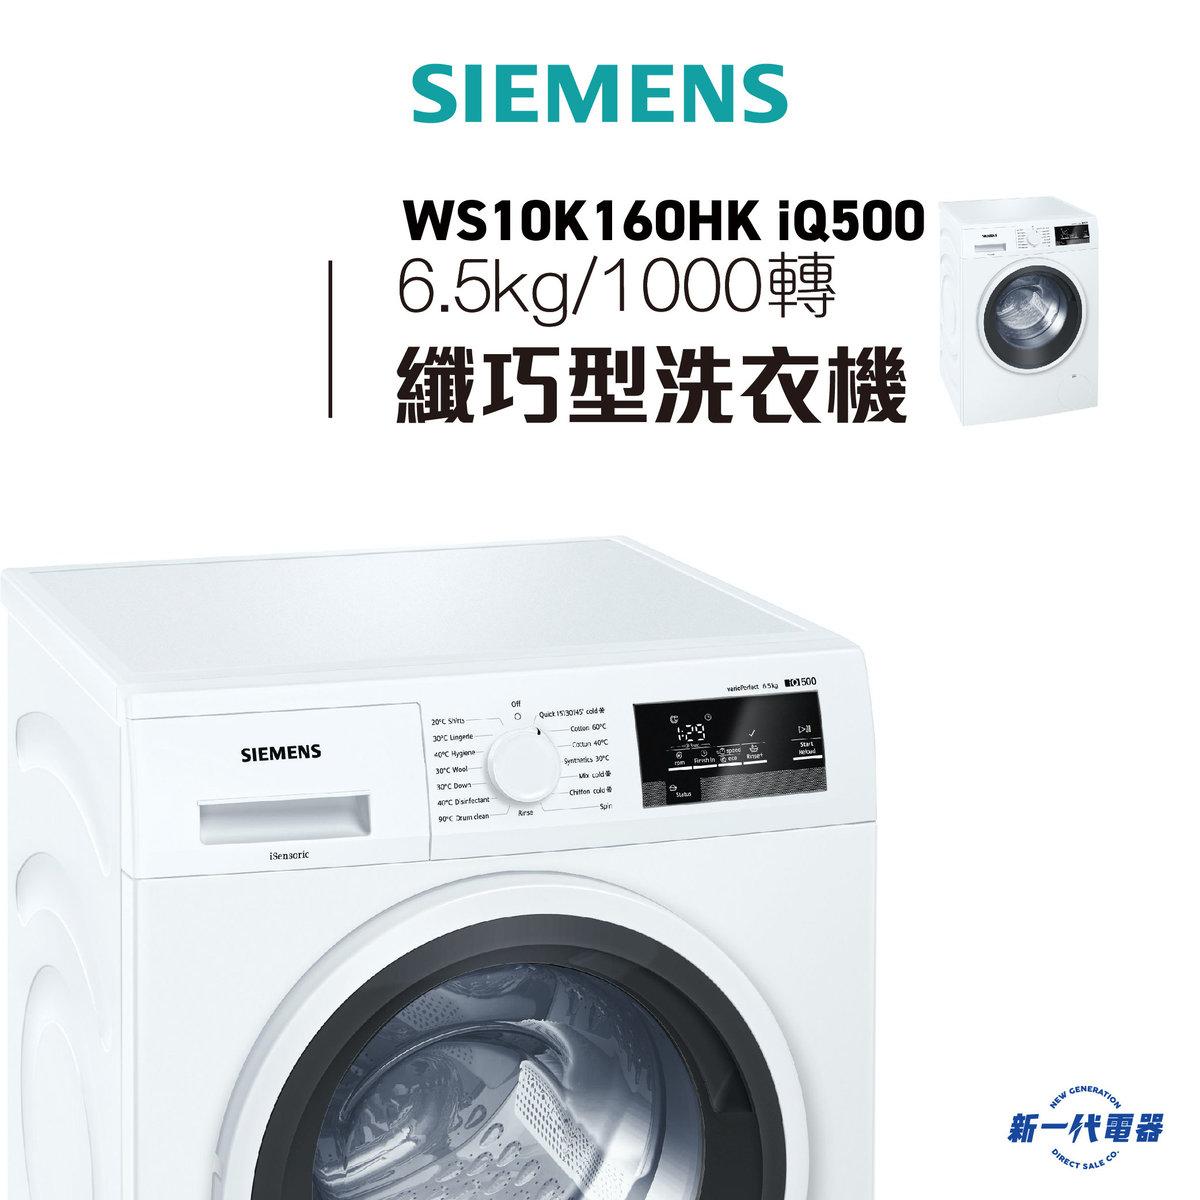 WS10K160HK  iQ500 Frontloading slim washer